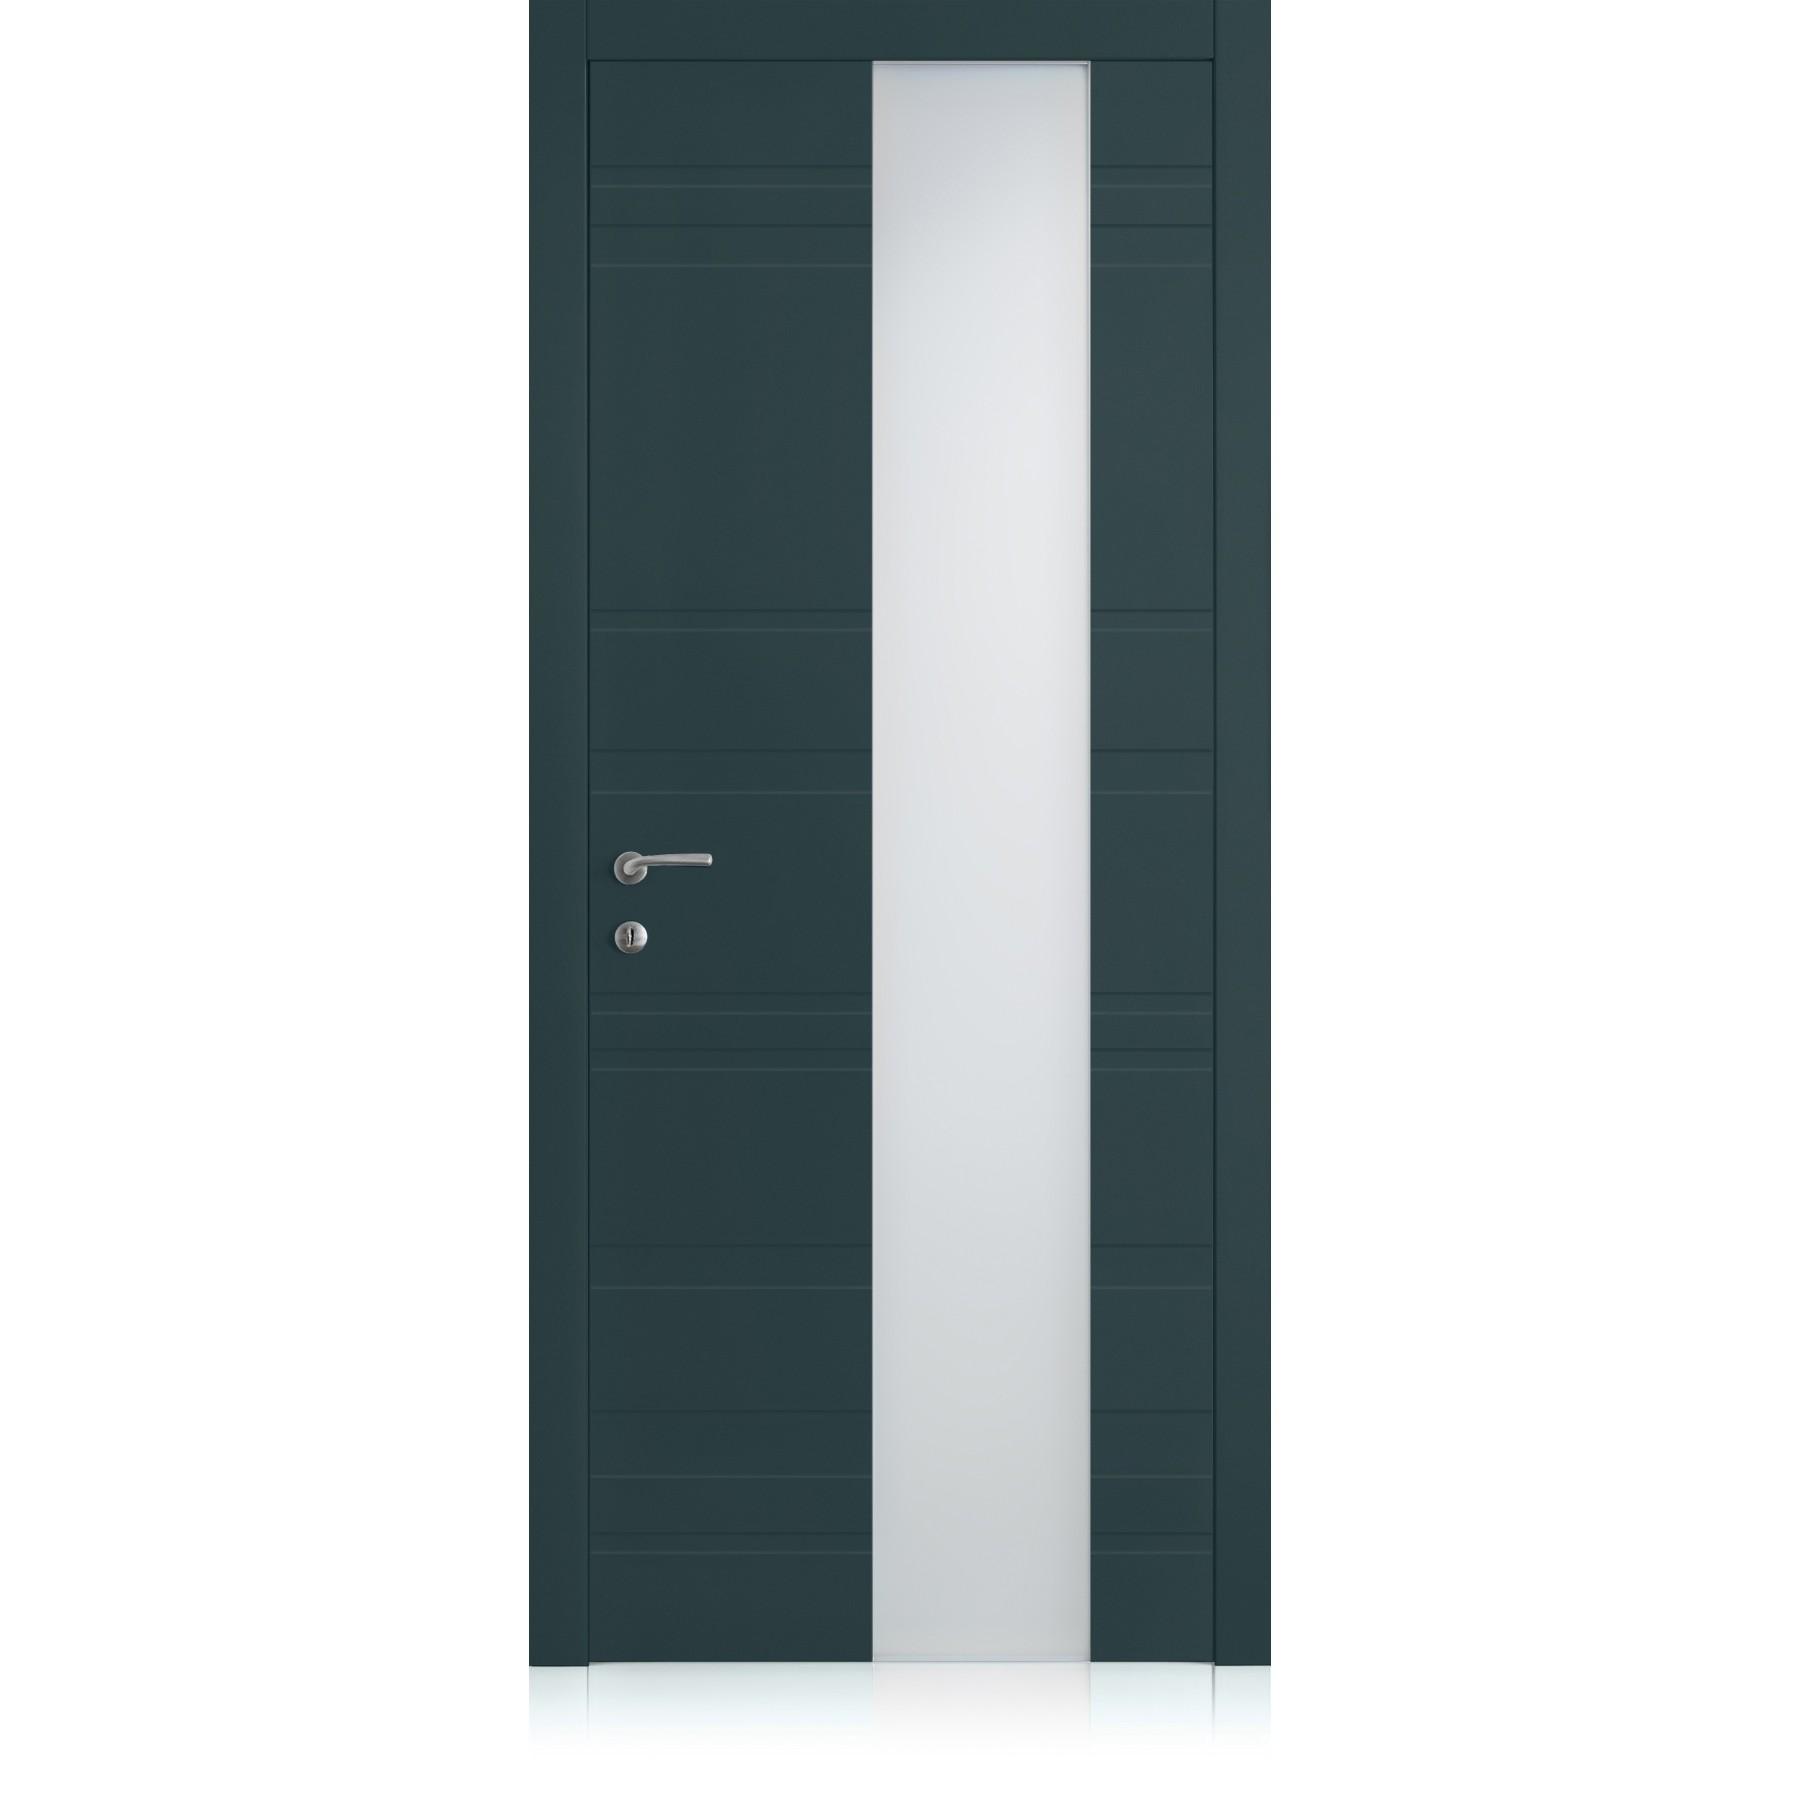 Yncisa Styla Vetro Metallo Dark Laccato ULTRAopaco door